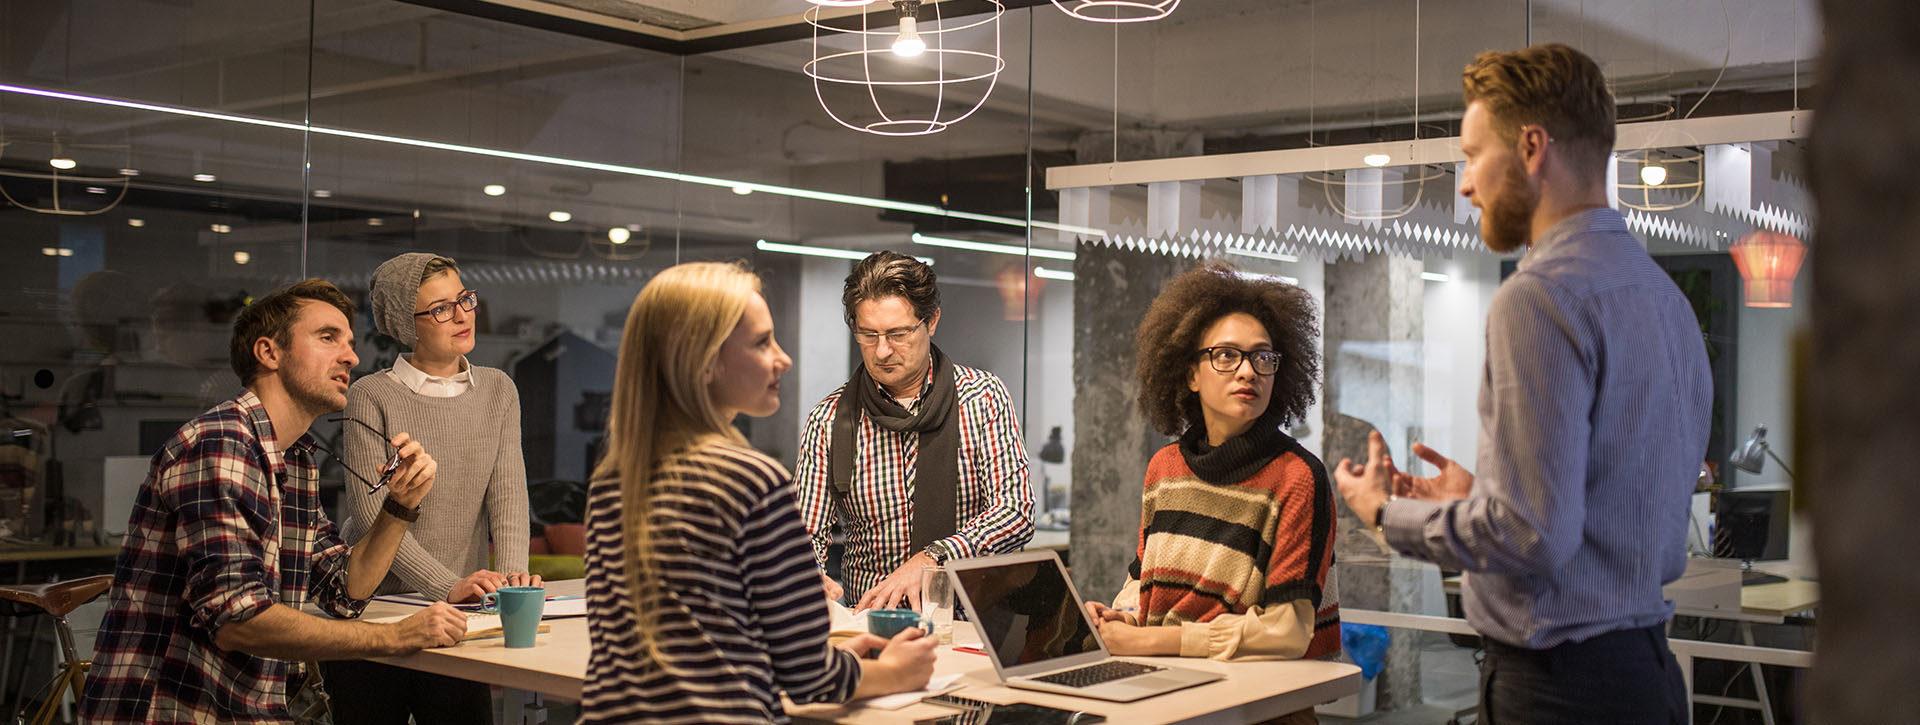 Xamk Open University Start-Up Passion MOOC